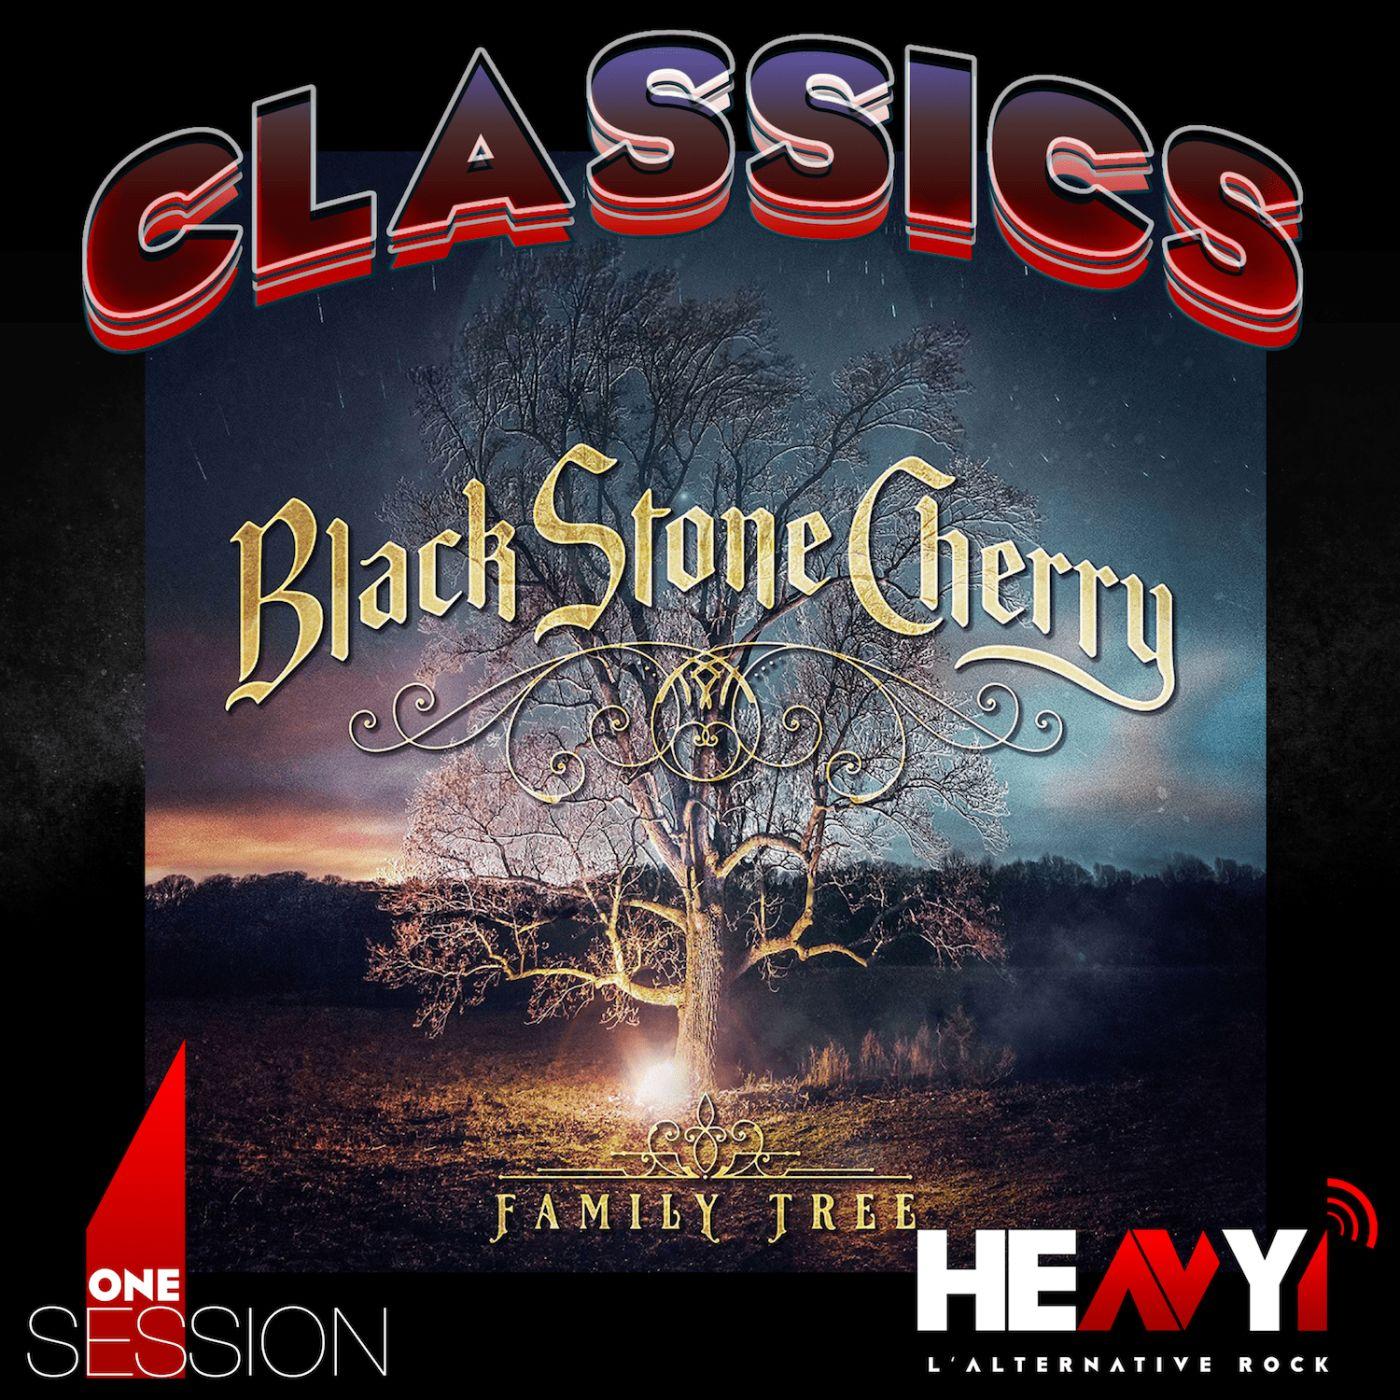 One Session avec Black Stone Cherry